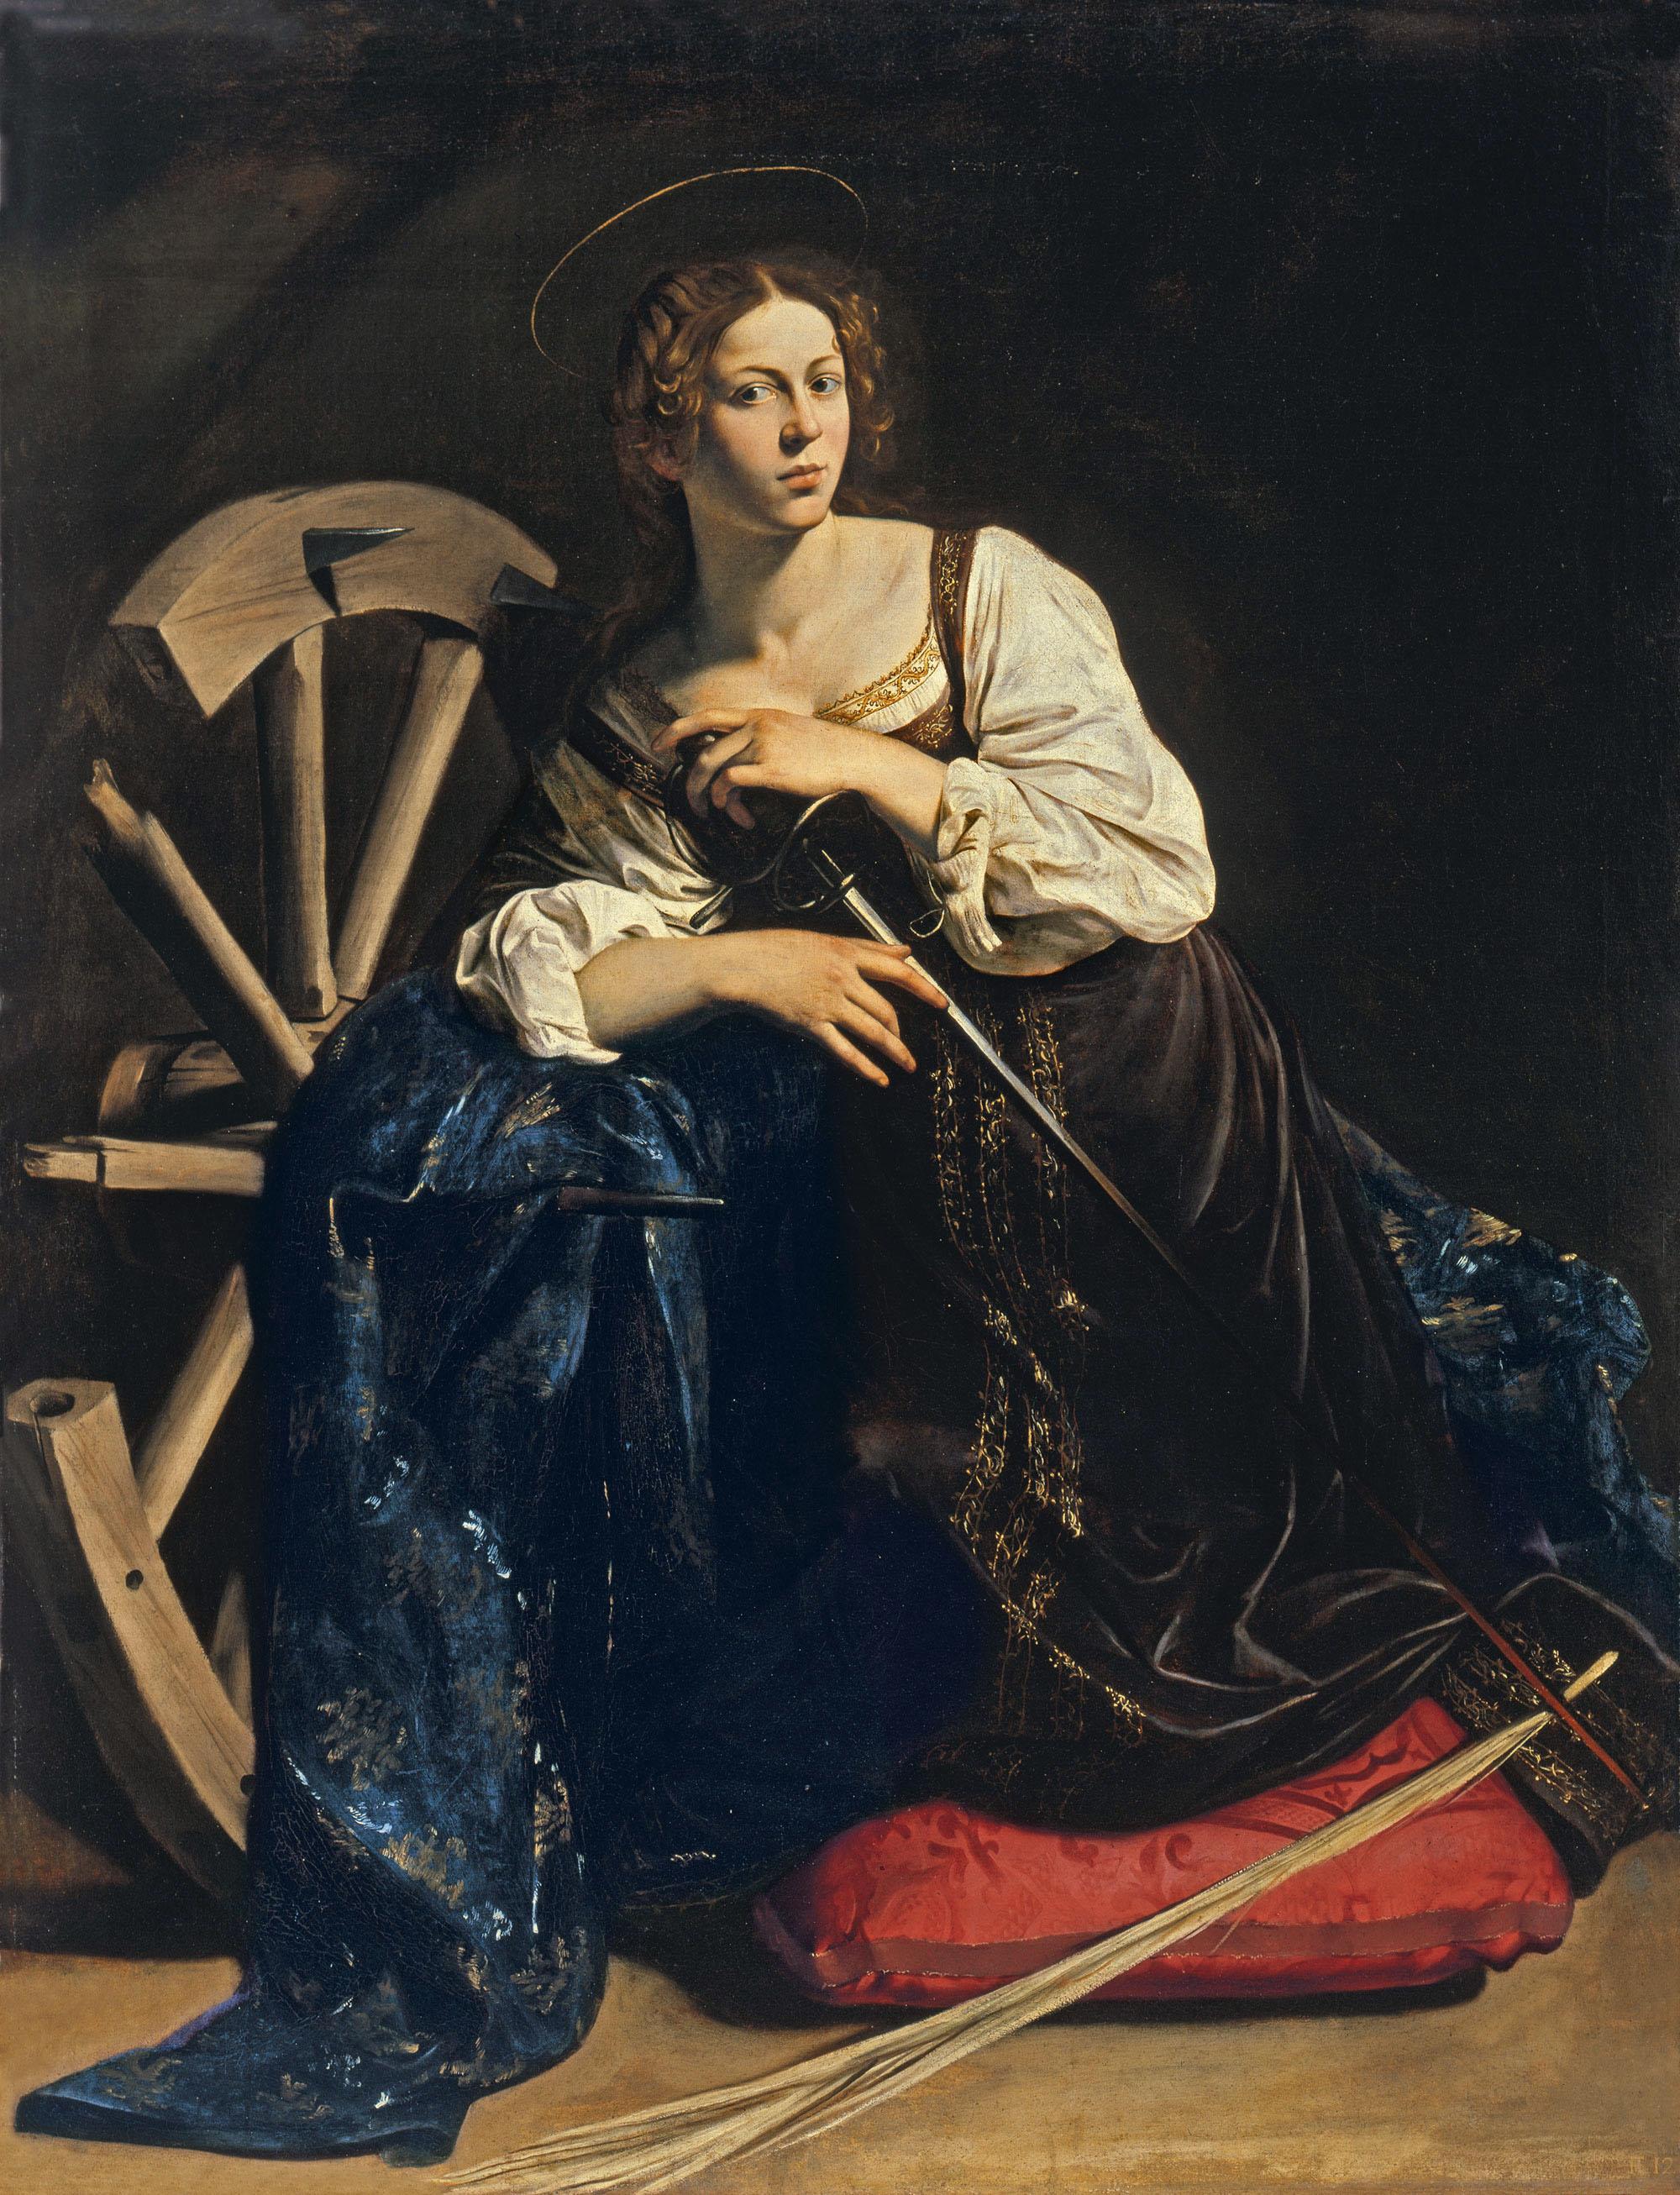 Караваджо. Святая Екатерина Александрийская. 1596.